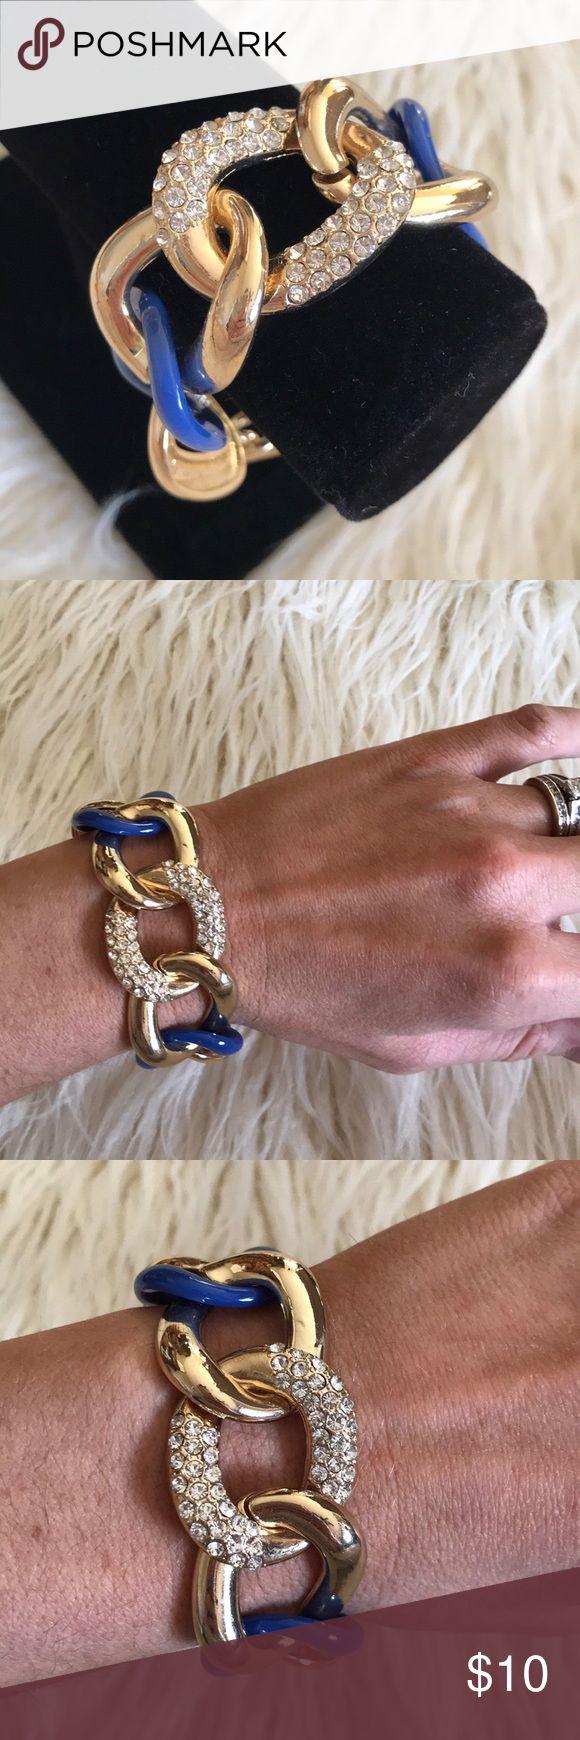 Blue Rhinestone Chain Link Bracelet Blue rhinestone chain link bracelet Jewelry Bracelets